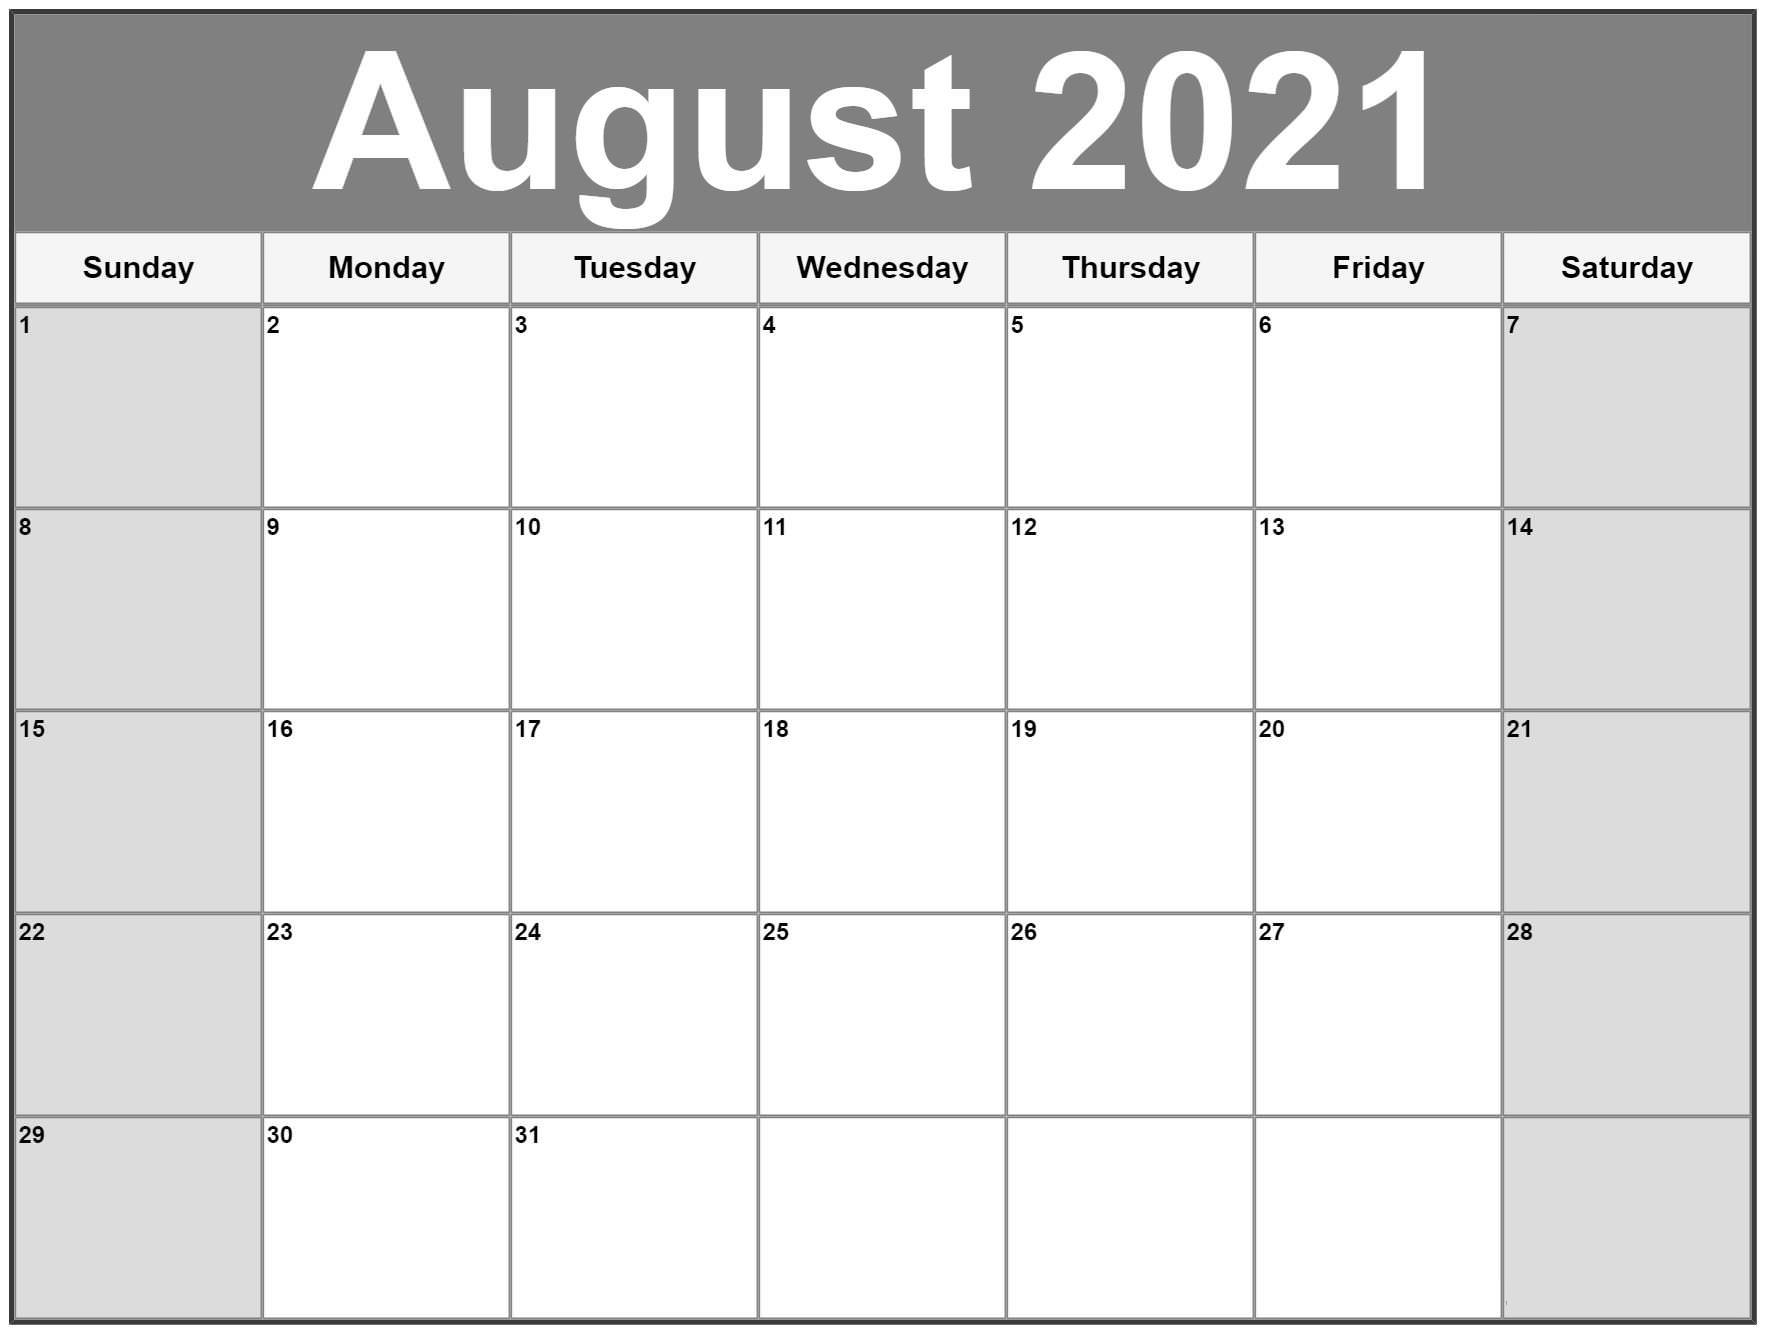 August 2021 Blank Calendar